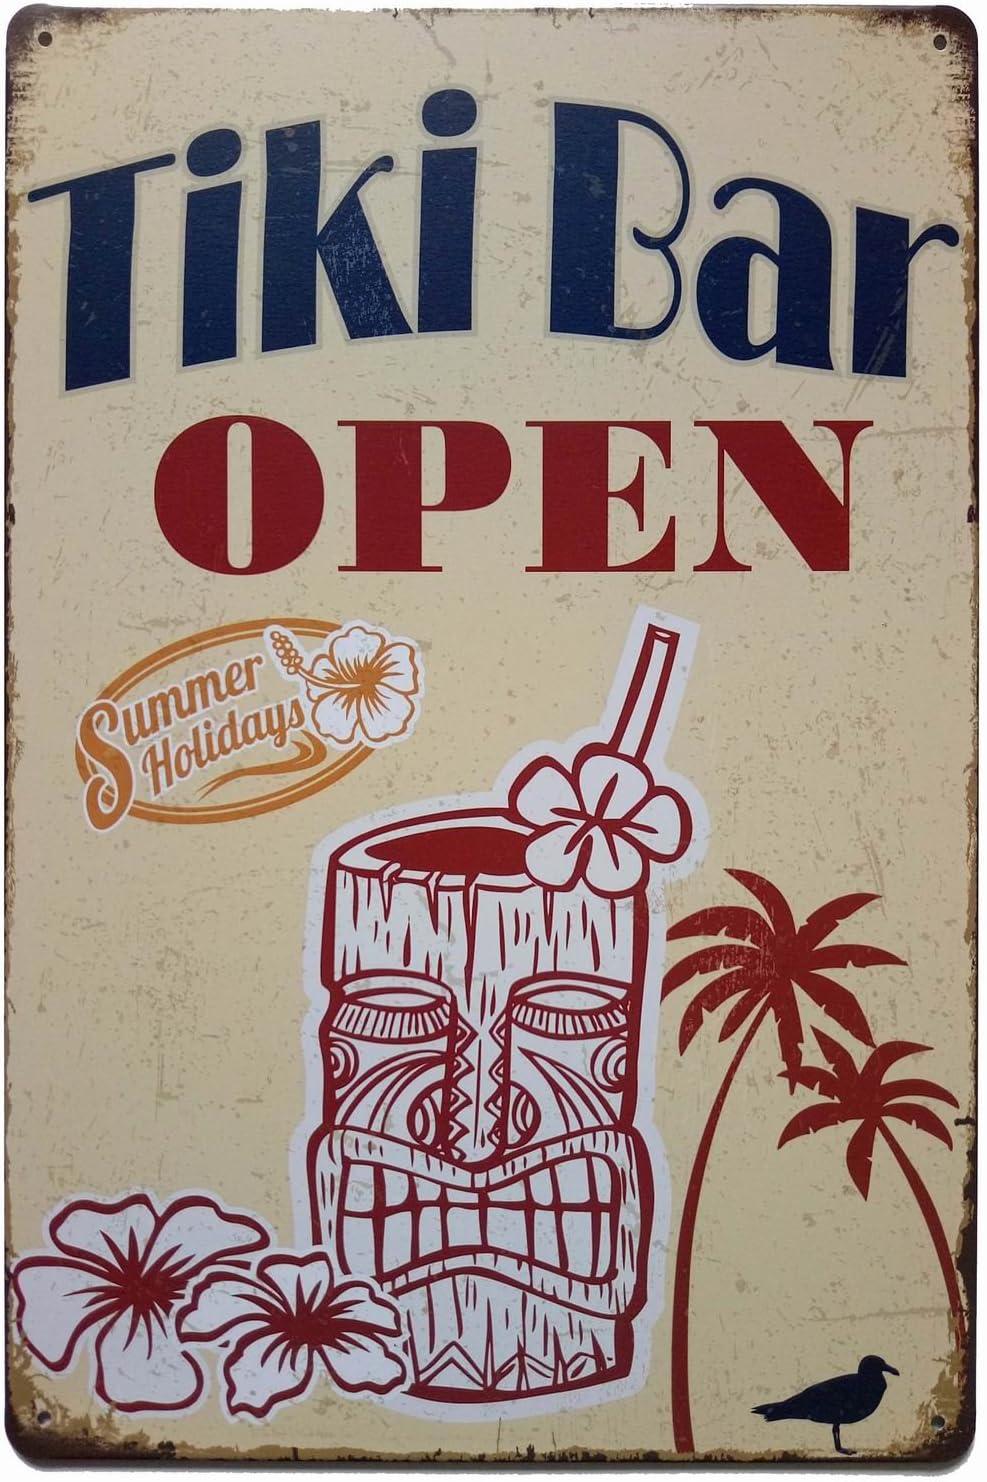 ERLOOD Tiki Bar Open Summer Holidays Vintage Metal Tin Sign Poster Home Plaque Poster Wall Art Pub Bar Decor 12 X 8